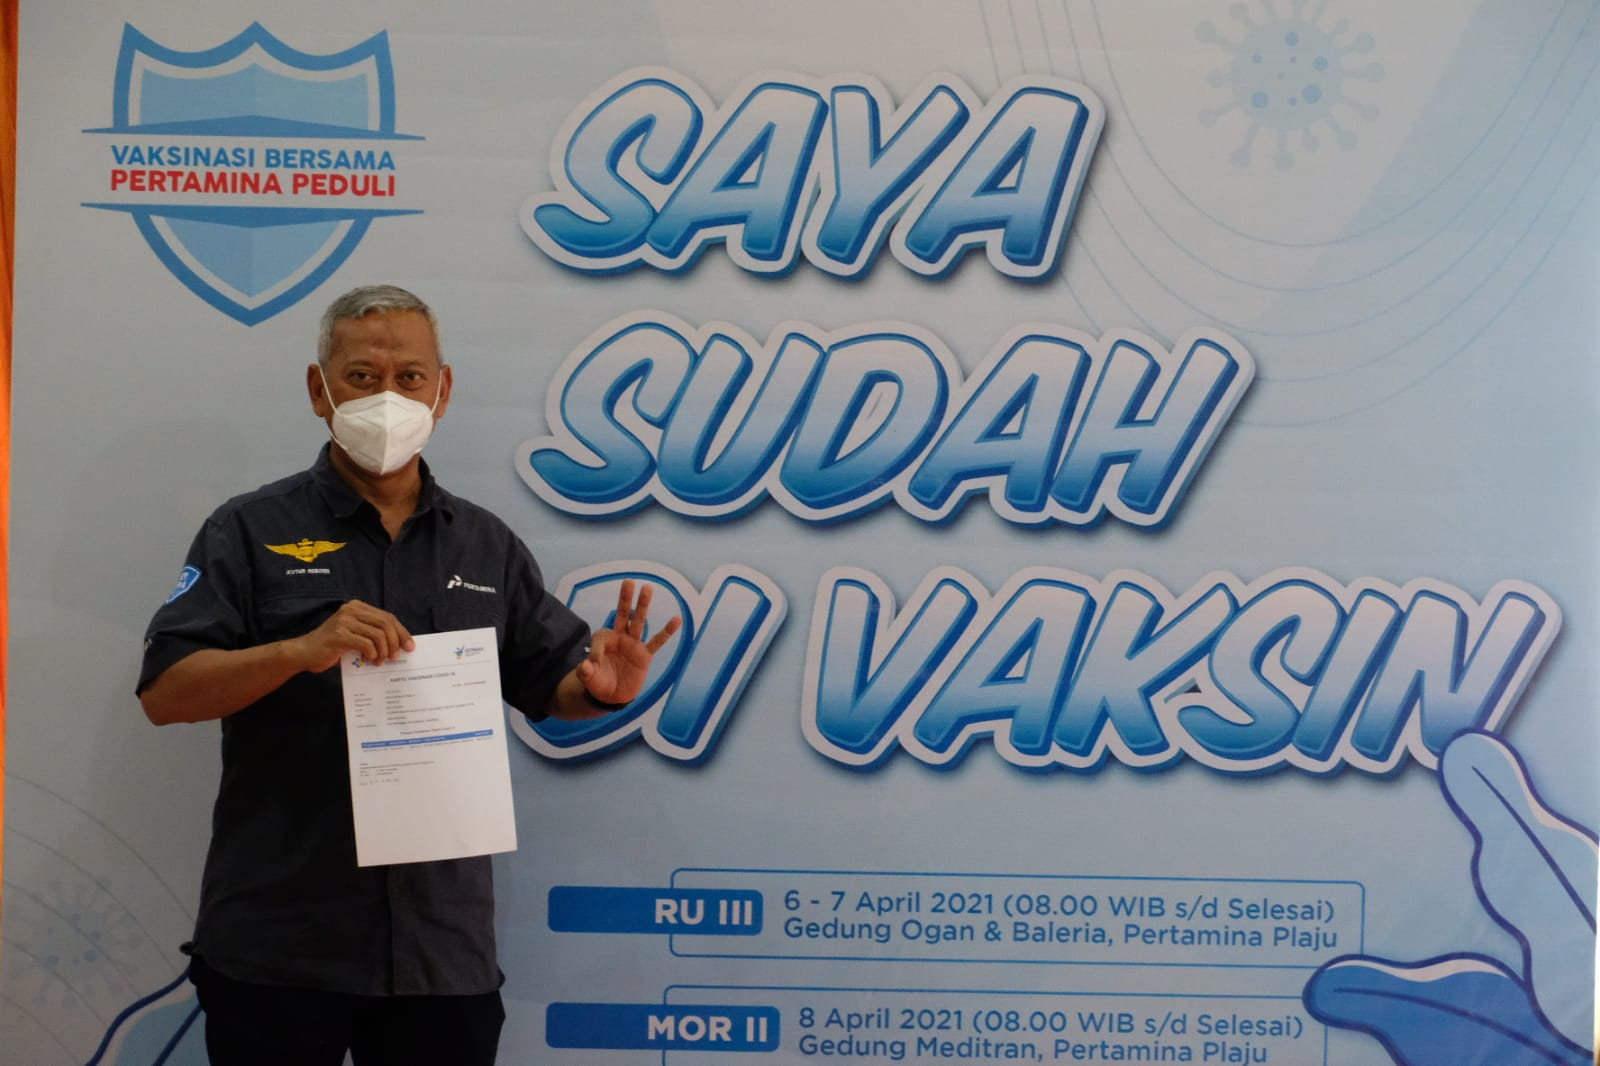 vaksinasi Covid-19 tahap pertama bersama Sinergi BUMN dan Rumah Sakit Pertamina Plaju bertempat di Gedung Ogan dan Balai Ria Pertamina RU III Plaju pada Selasa (6/4).